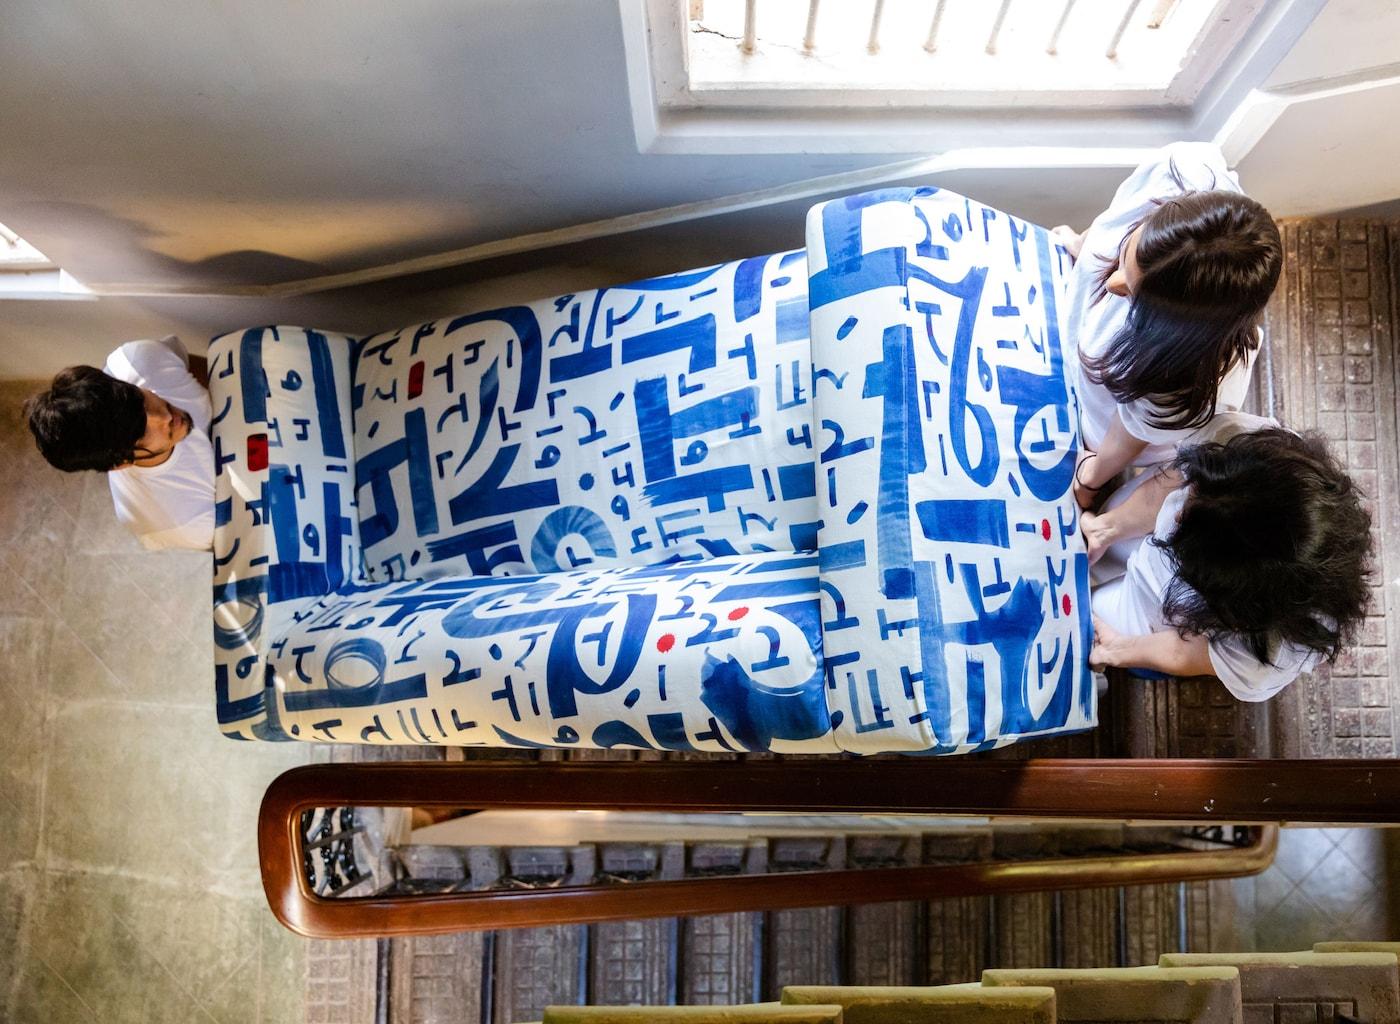 Tri tamnokose osobe nose plavu i belu KLIPPAN sofu uz stepenice.